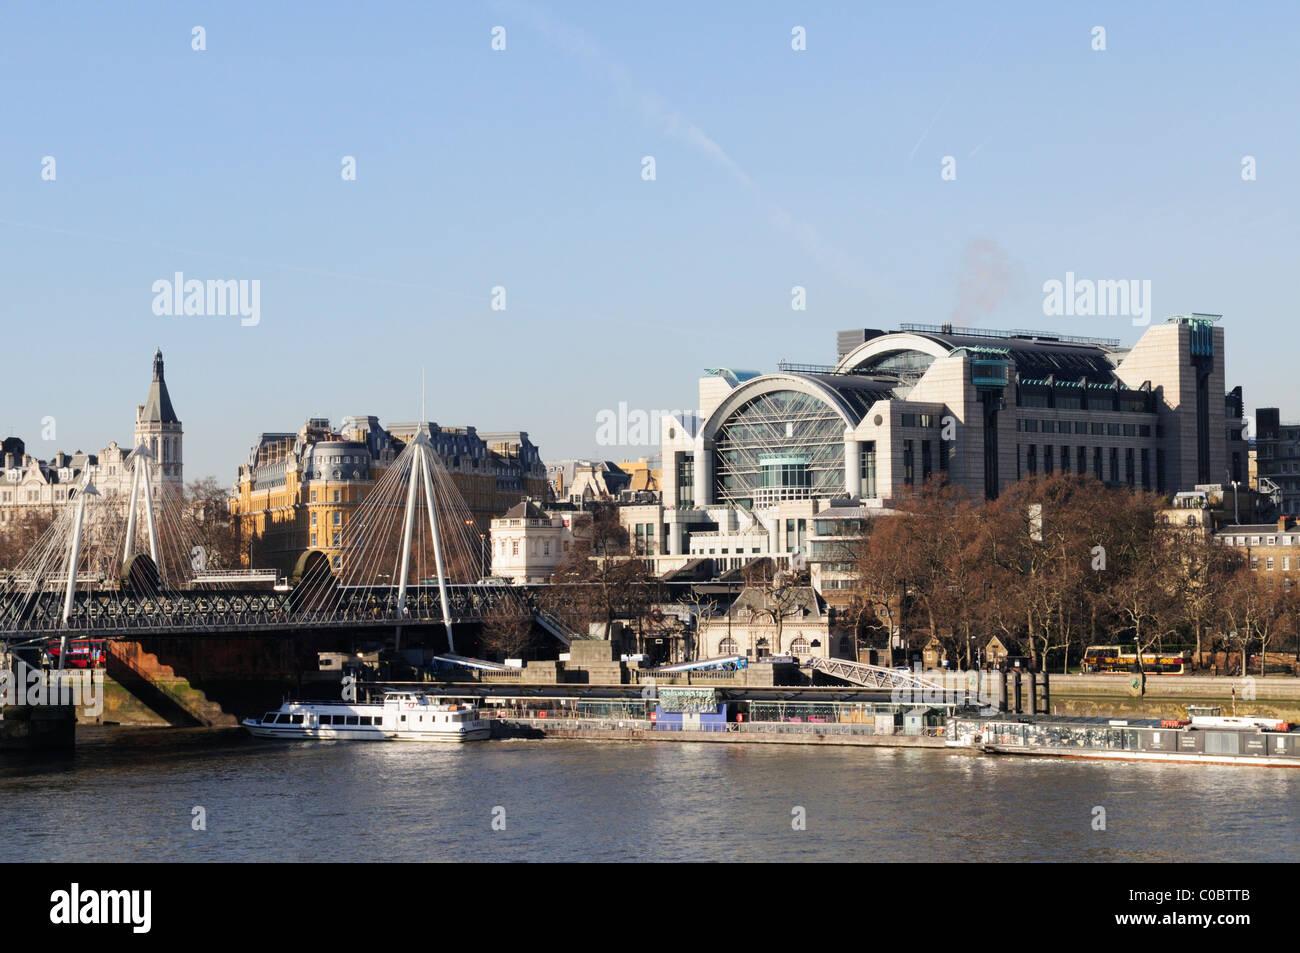 Charing Cross Station and Embankment Pier, London, England, Uk - Stock Image